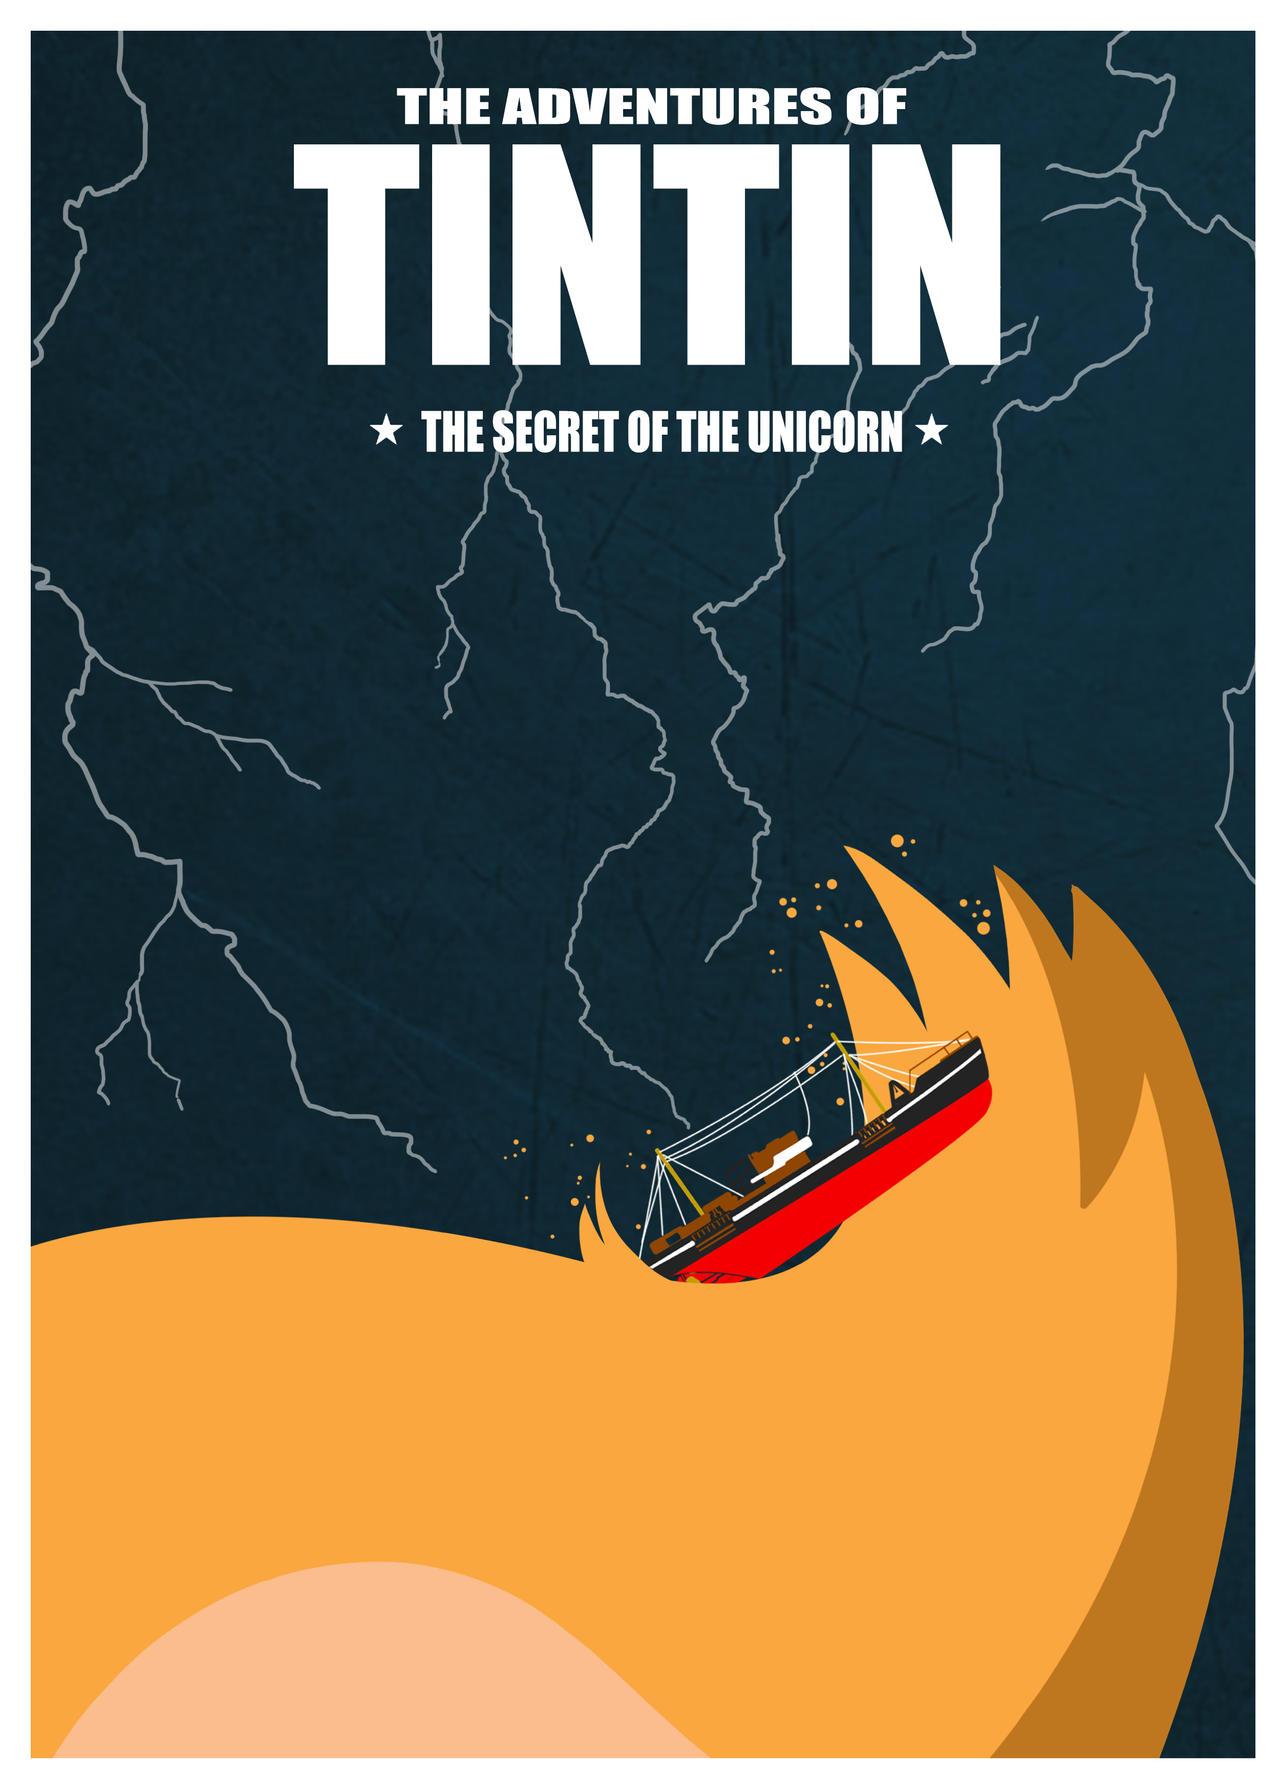 The Adventures of Tintin Minimalist Poster by saigo21 on ...